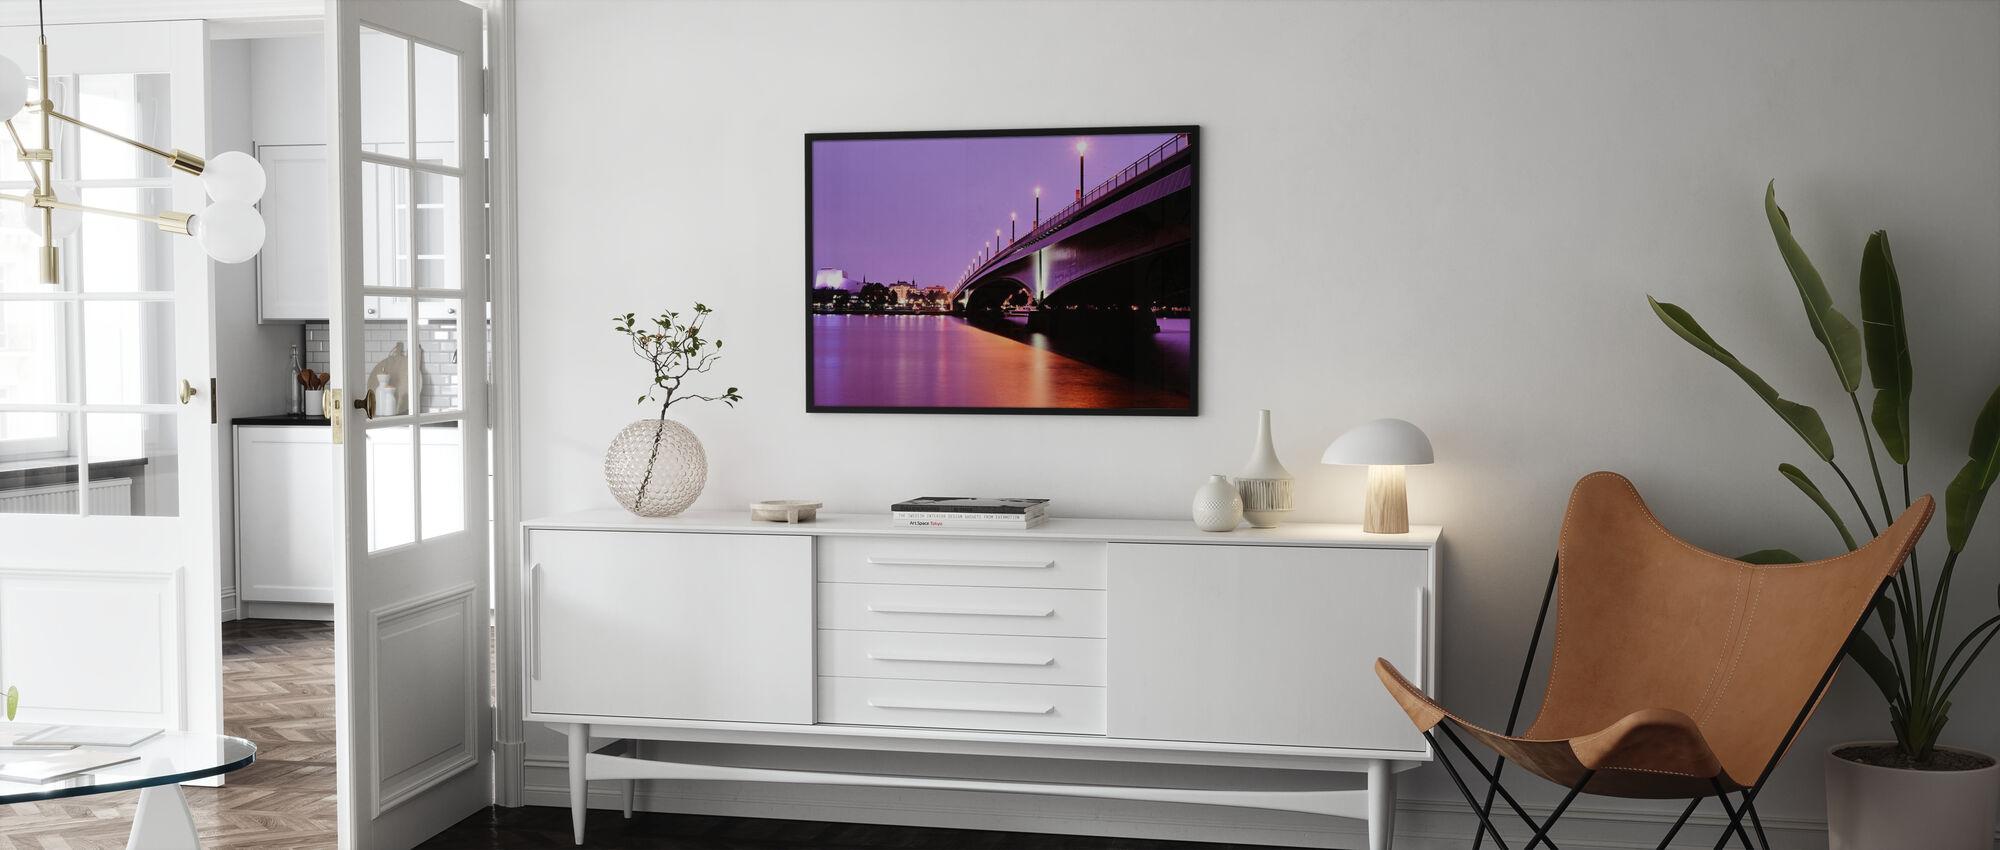 Kennedy Bridge over the River Rhine - Poster - Living Room